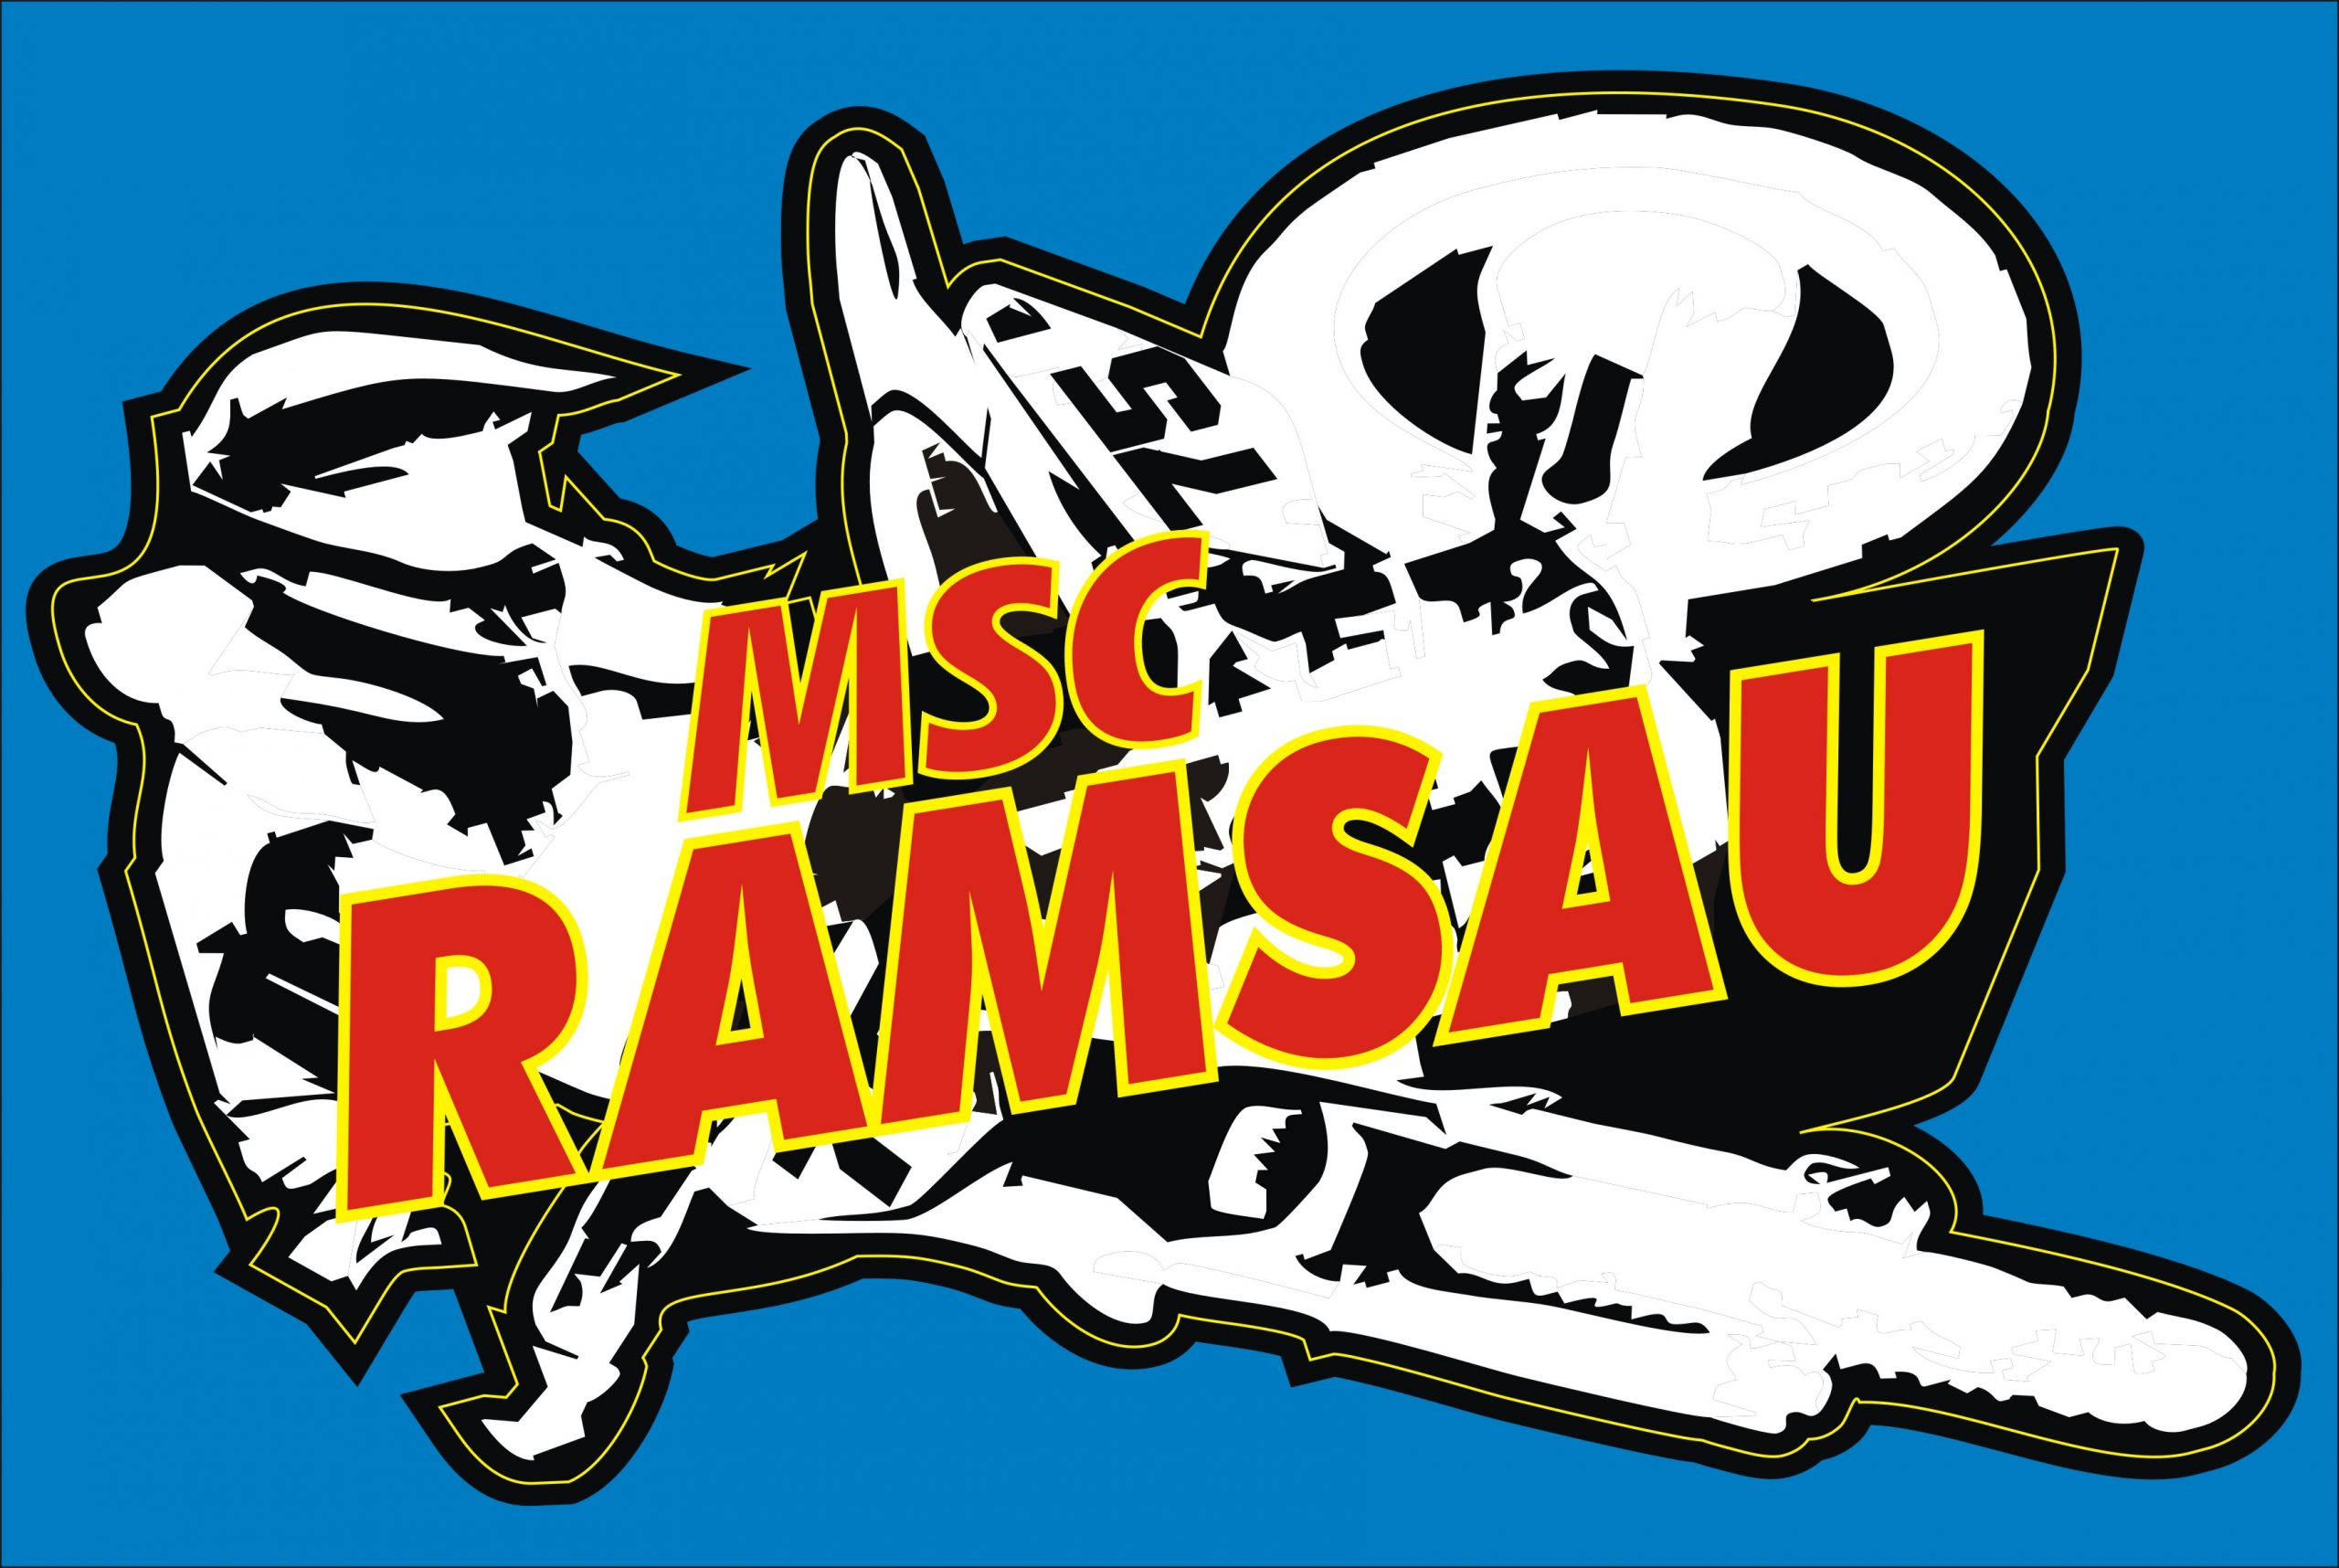 MSC Ramsau